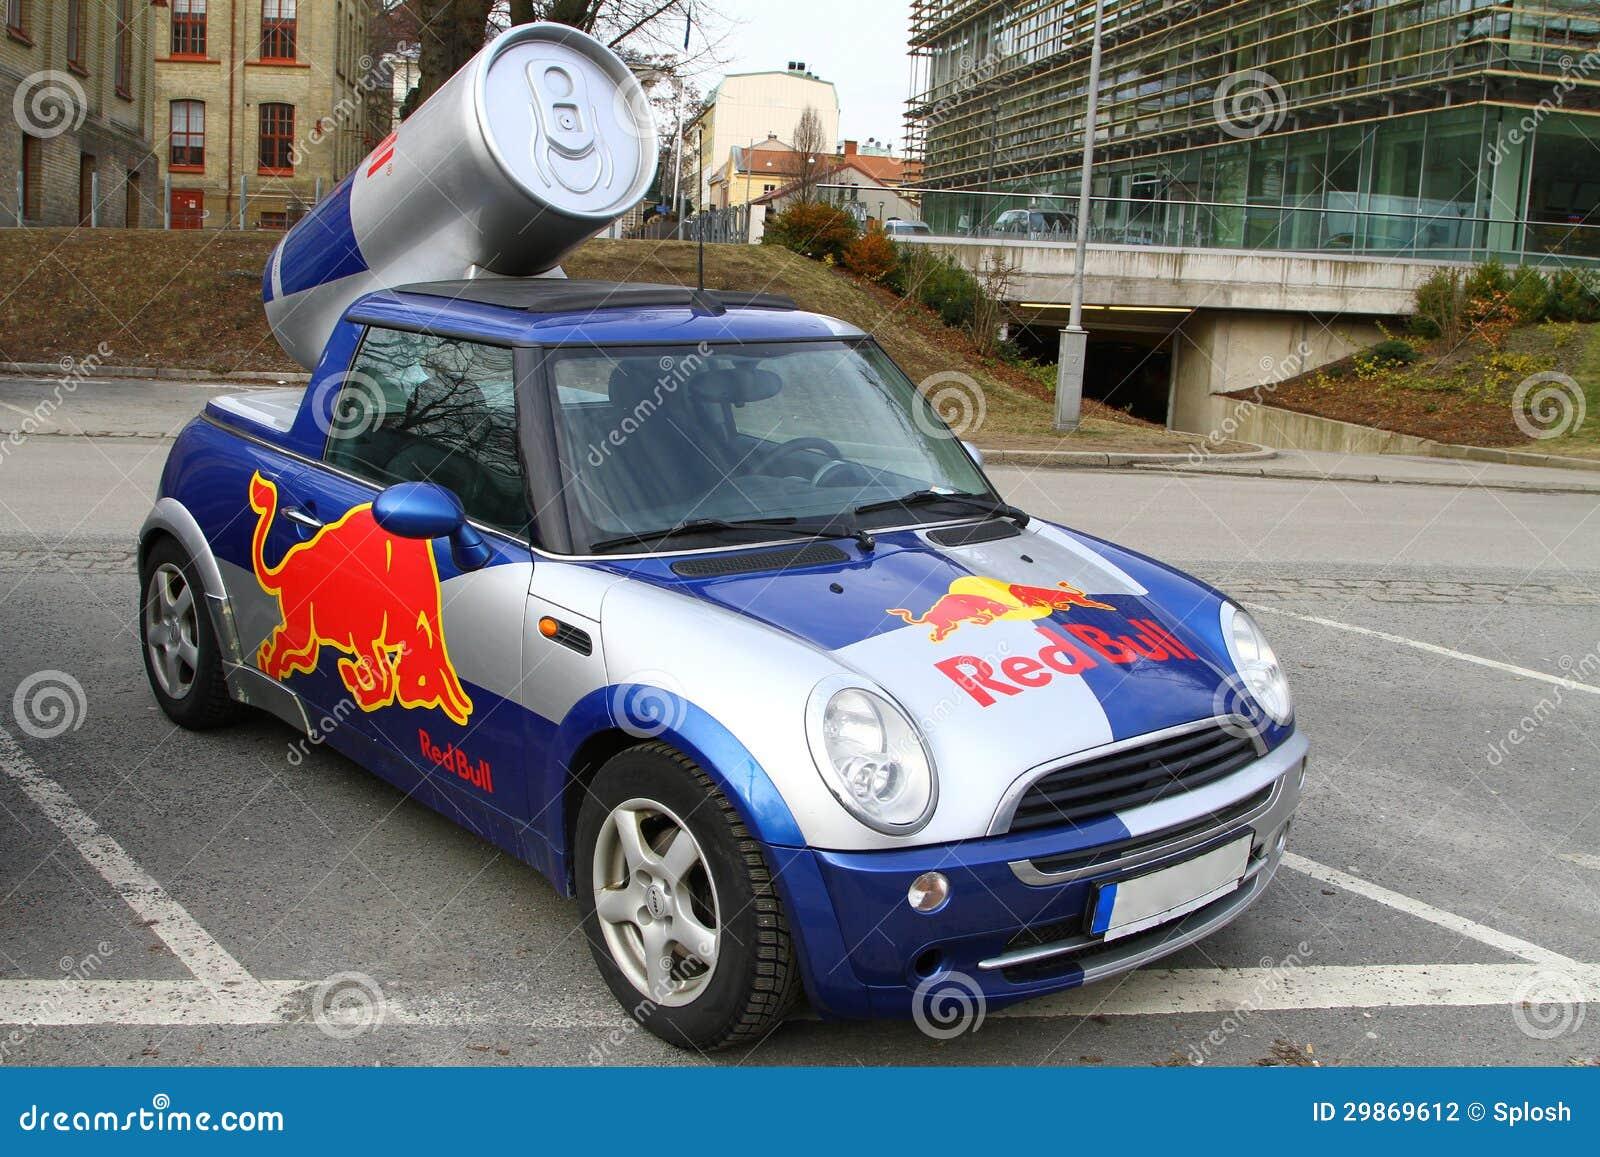 Mini Cooper Red Bull >> Red Bull Mini Cooper Publicity Car Editorial Photography - Image: 29869612